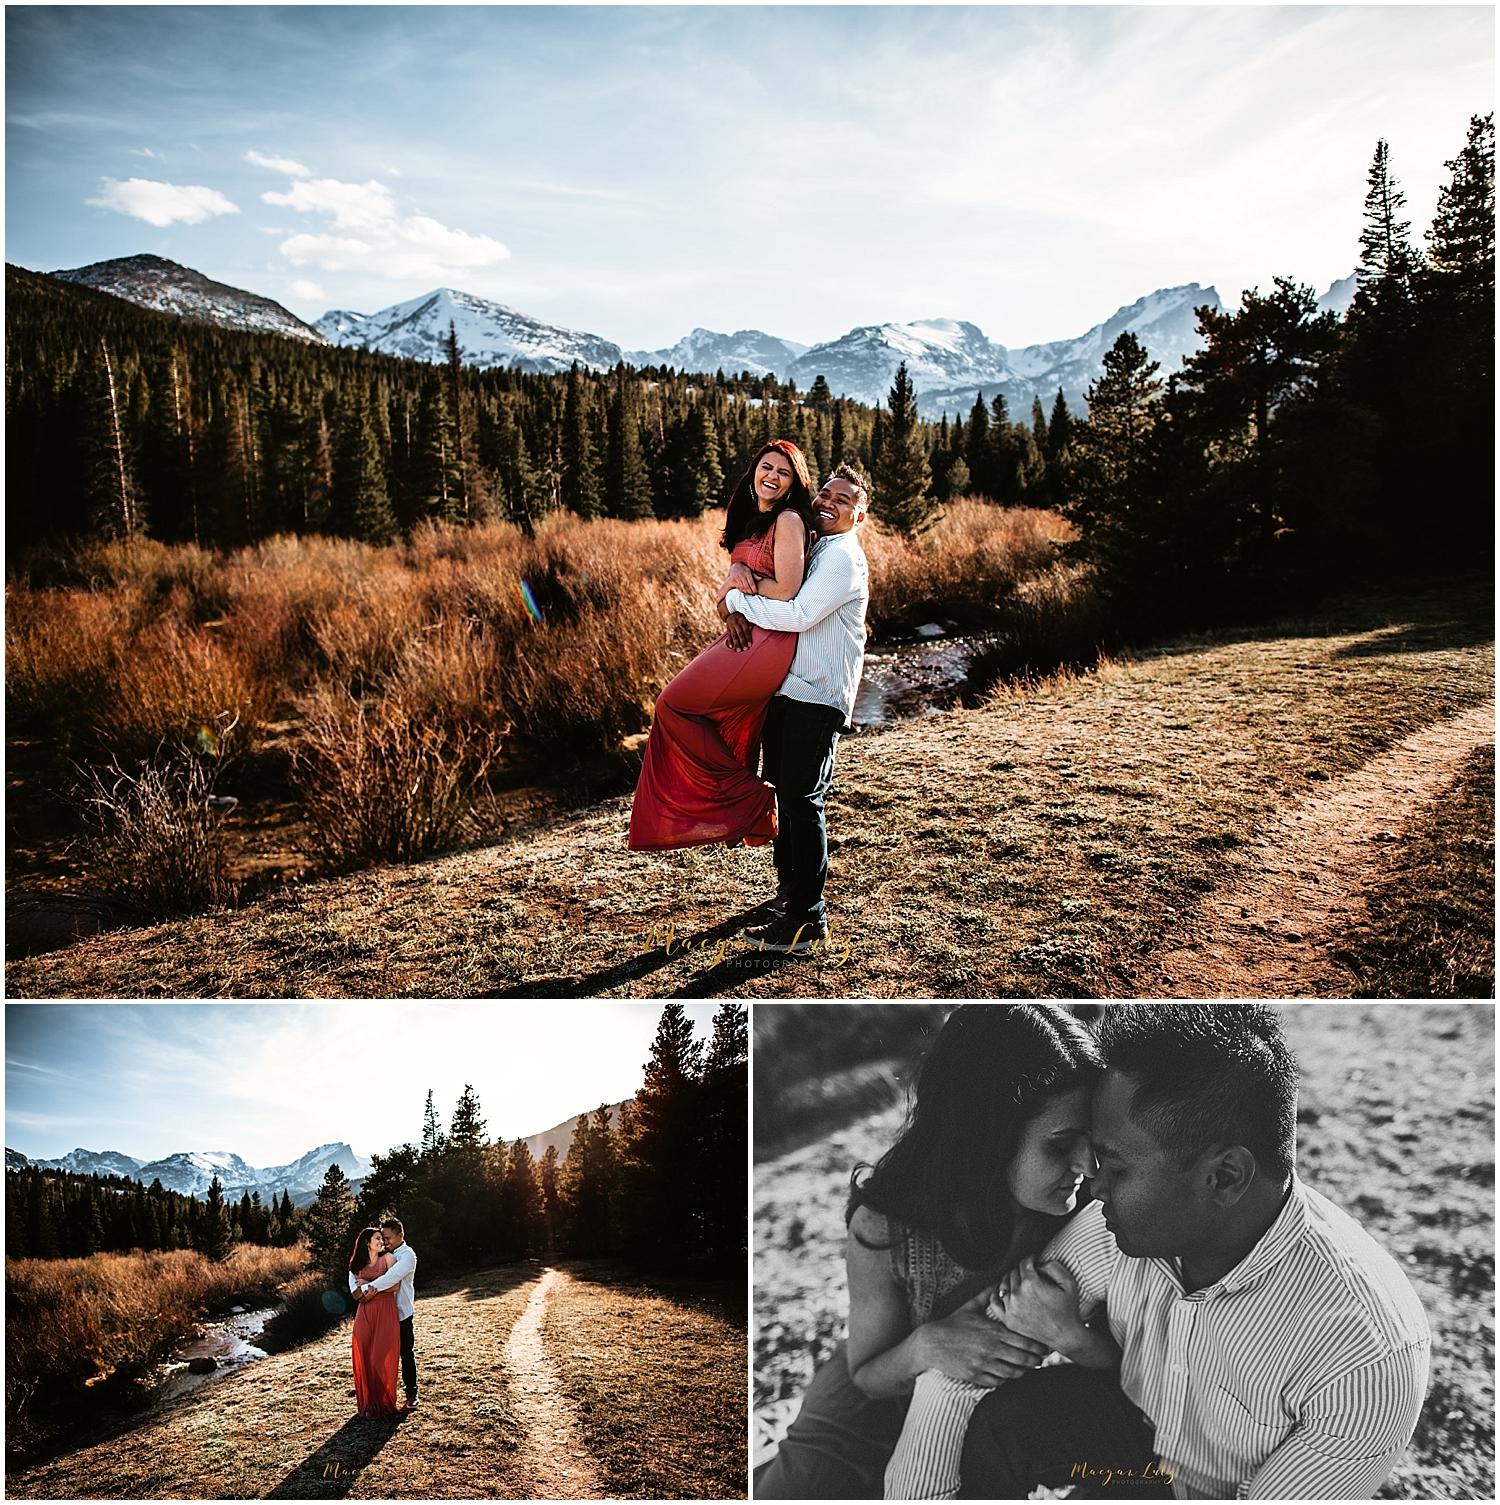 Destination-engagement-wedding-photographer-Colorado-Rocky-Mountain-National-Park-Session_0054.jpg